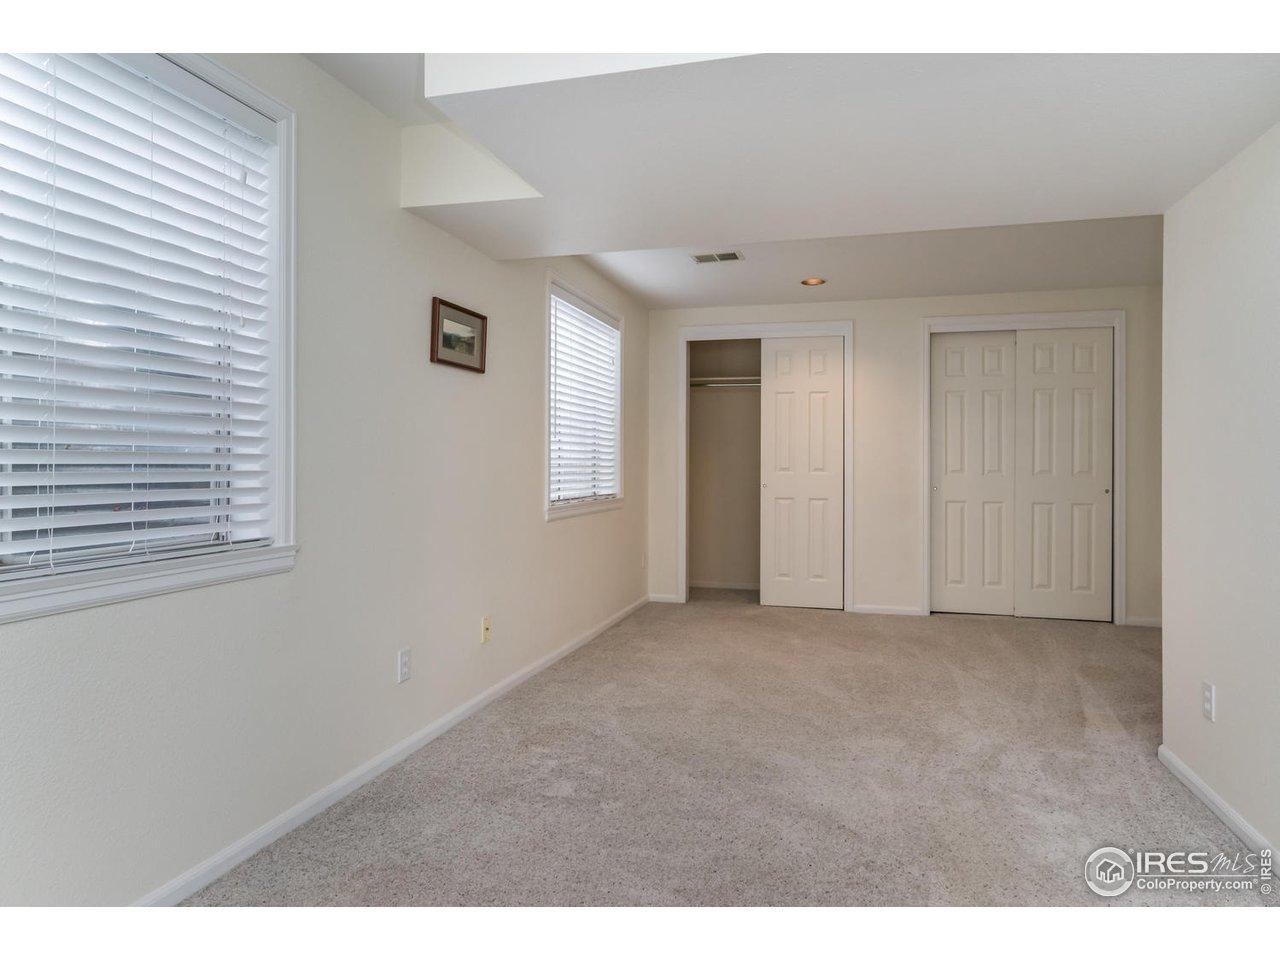 Large third bedroom